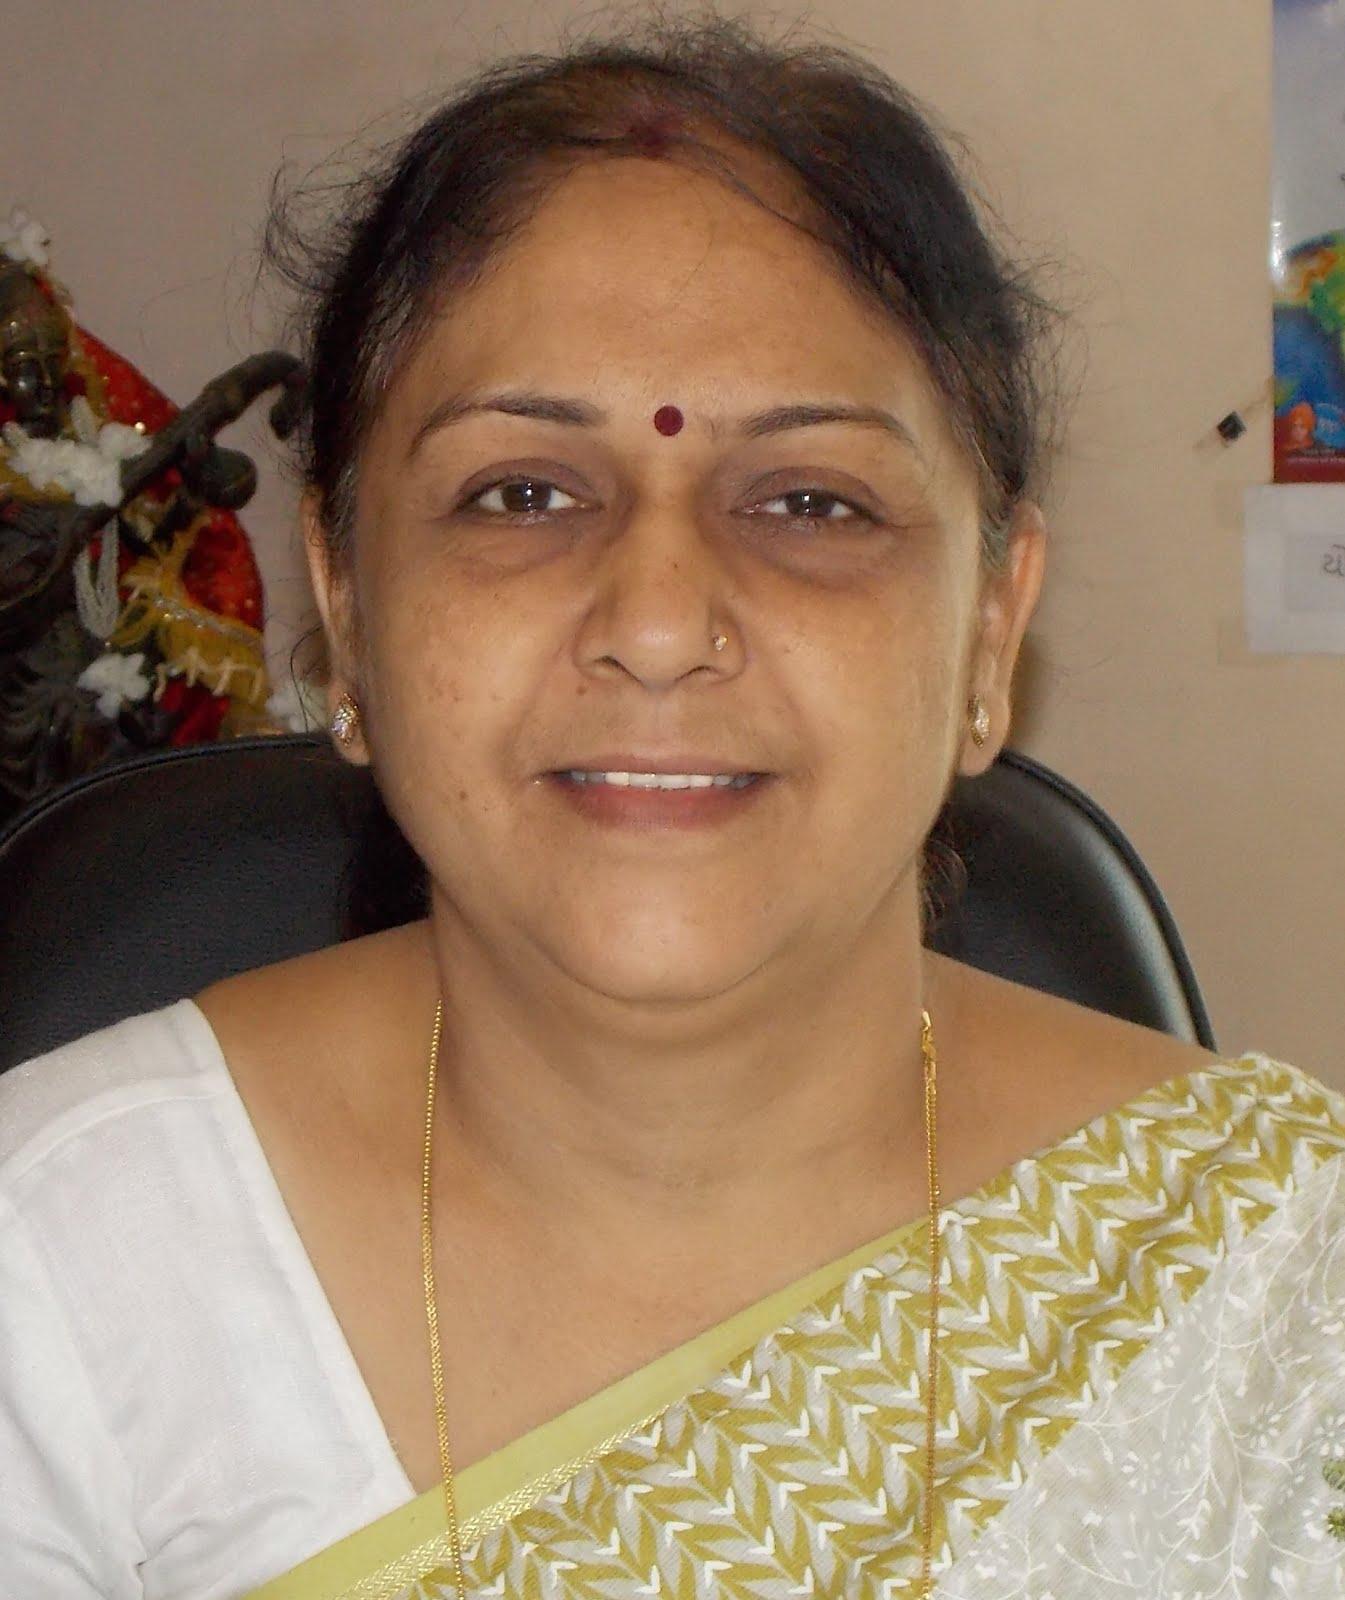 Mrs. Jyotiben Parikh